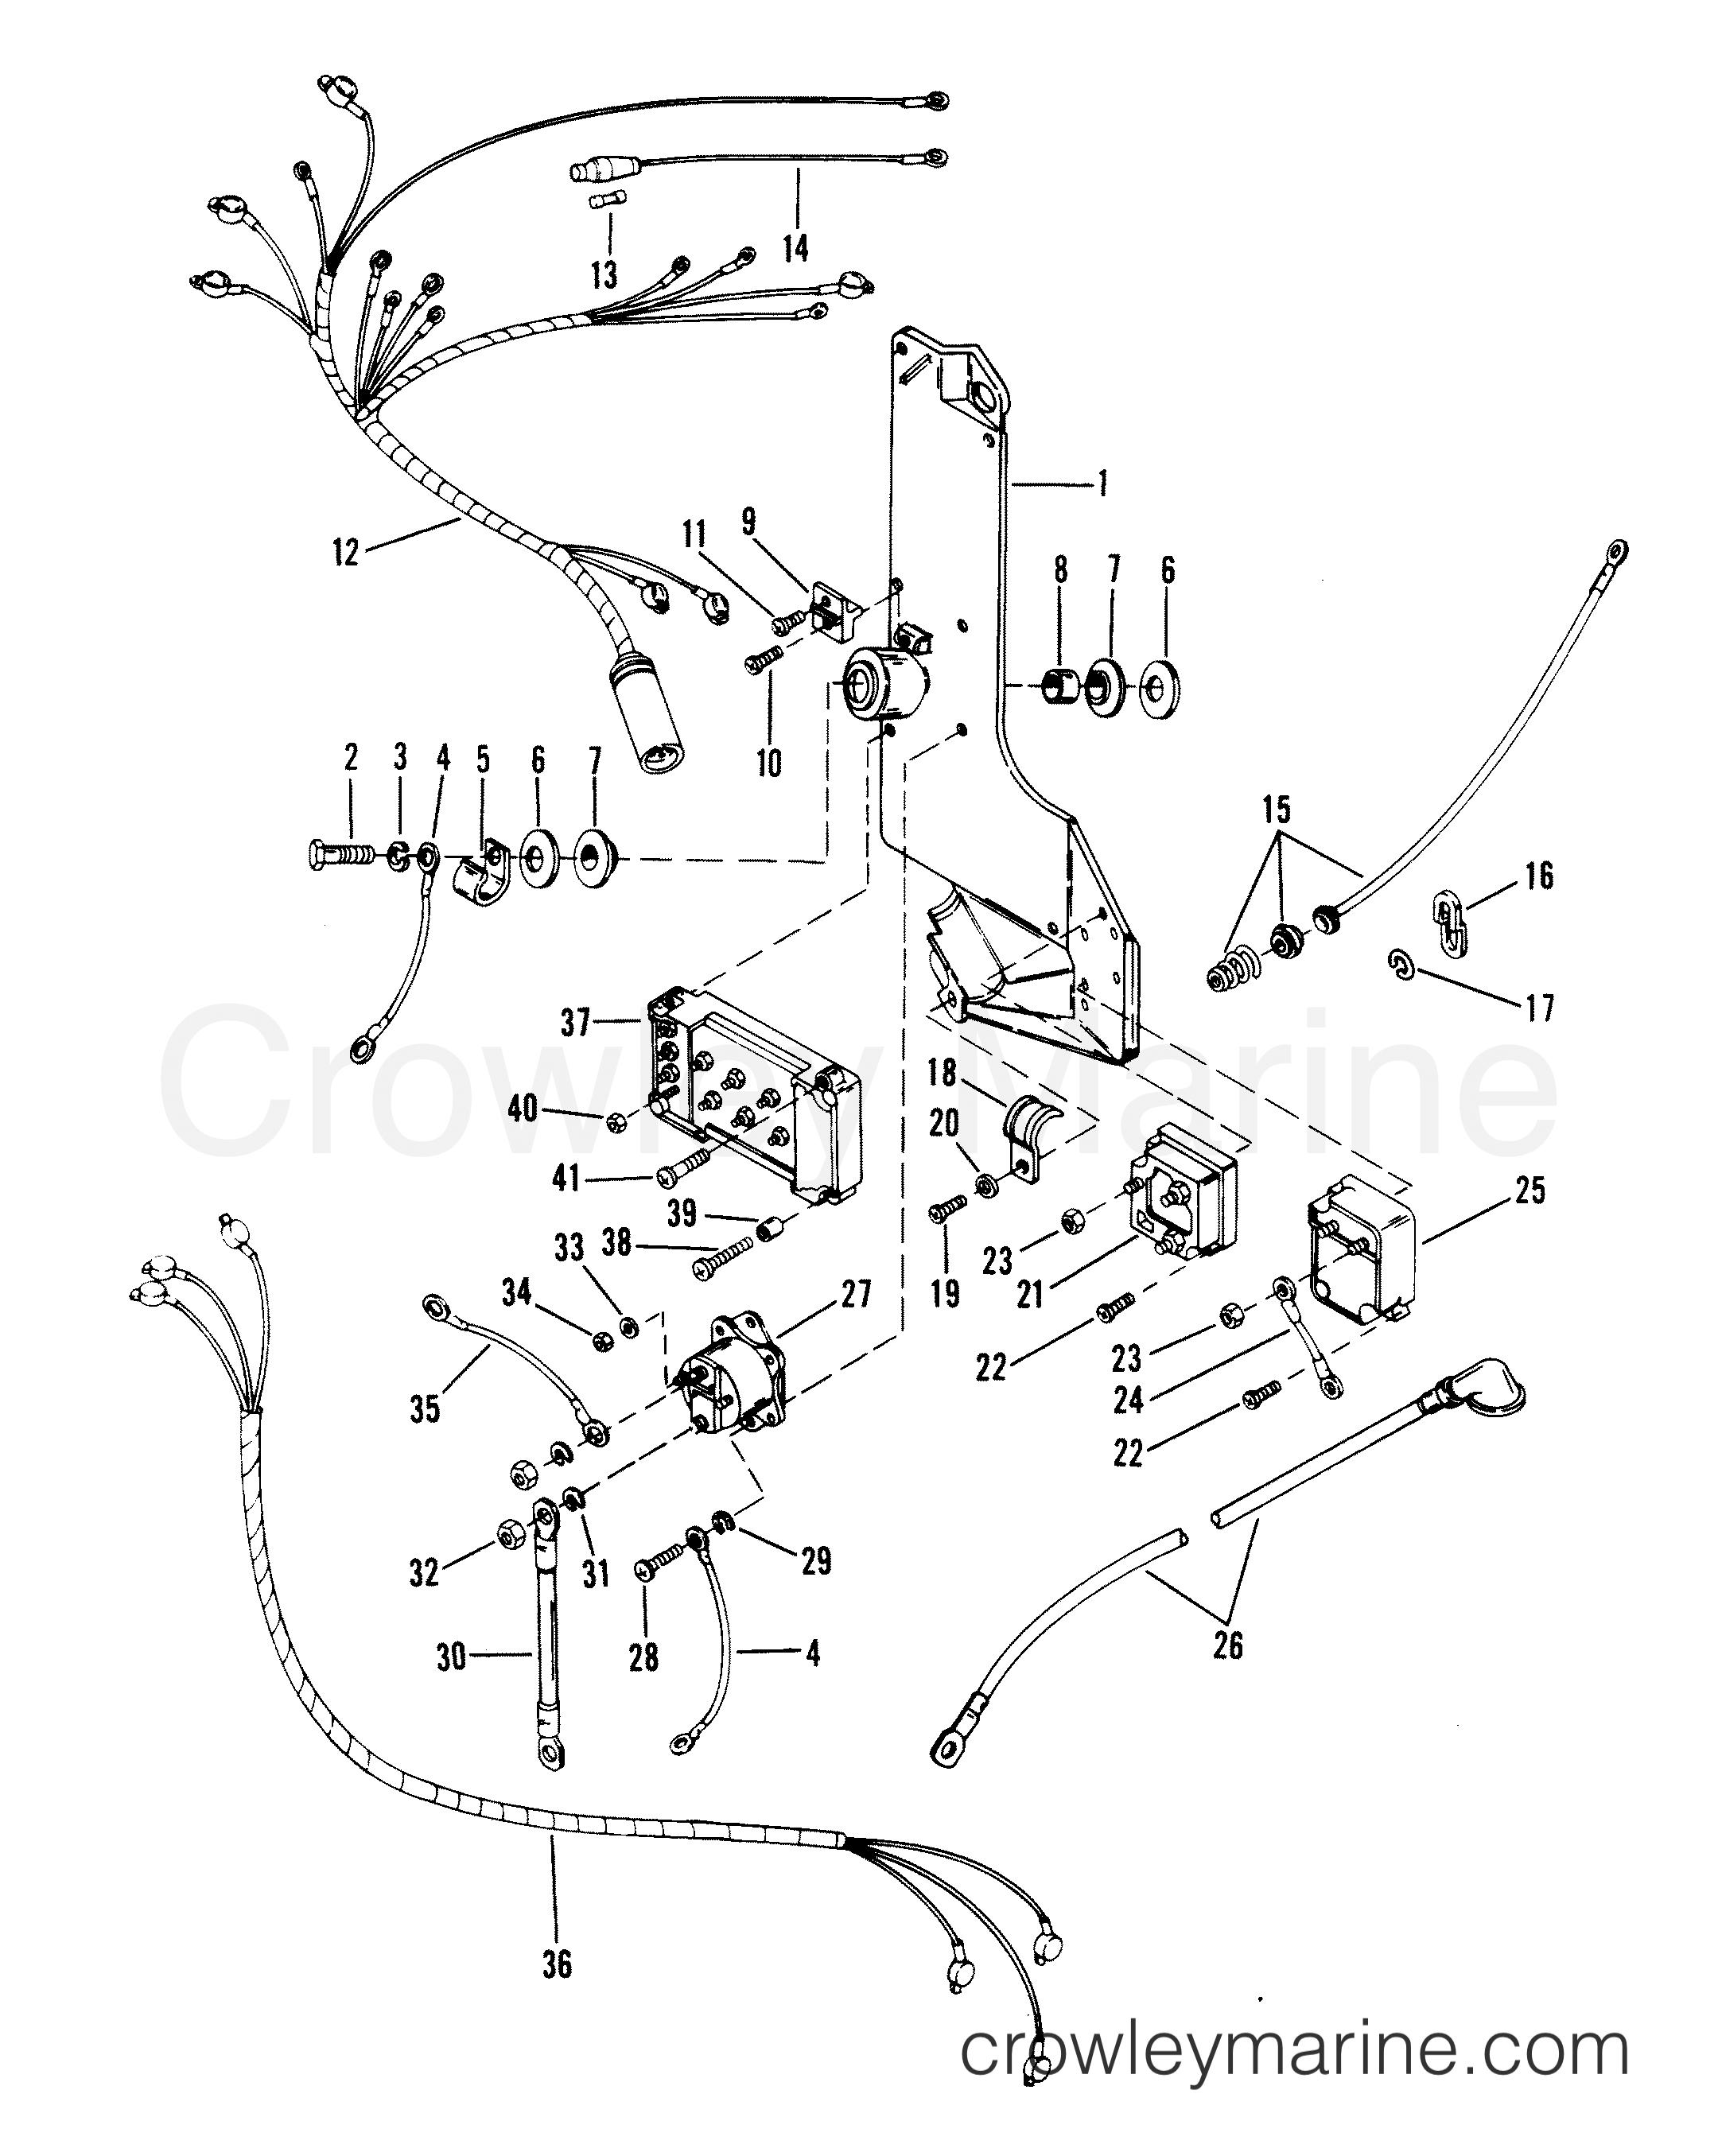 Rectifier For Mercury 115 Wiring Diagram